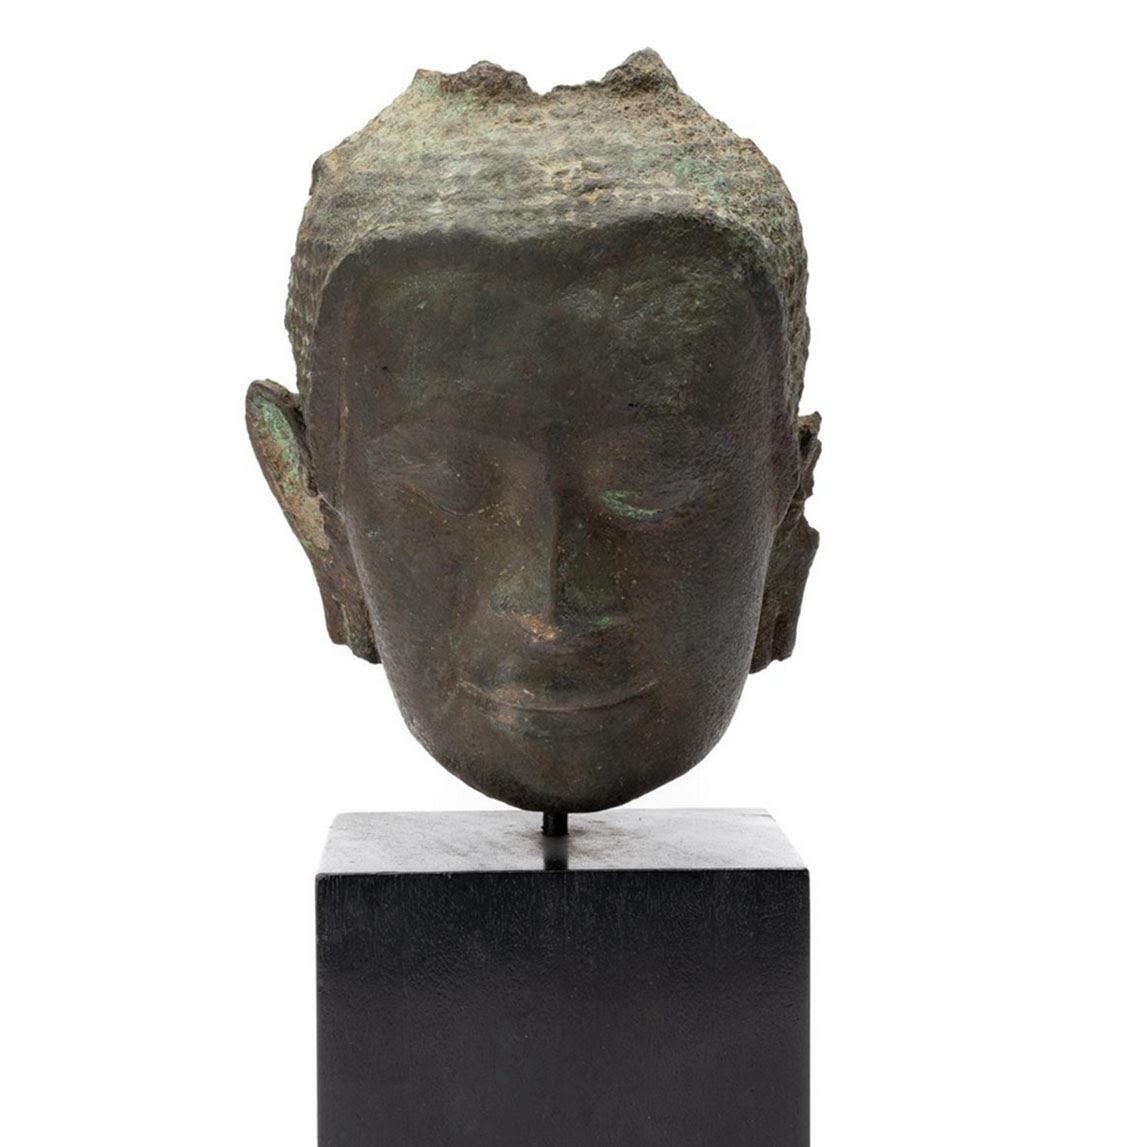 Lot 49. Thai Head of Buddha 12-13th century, bronze